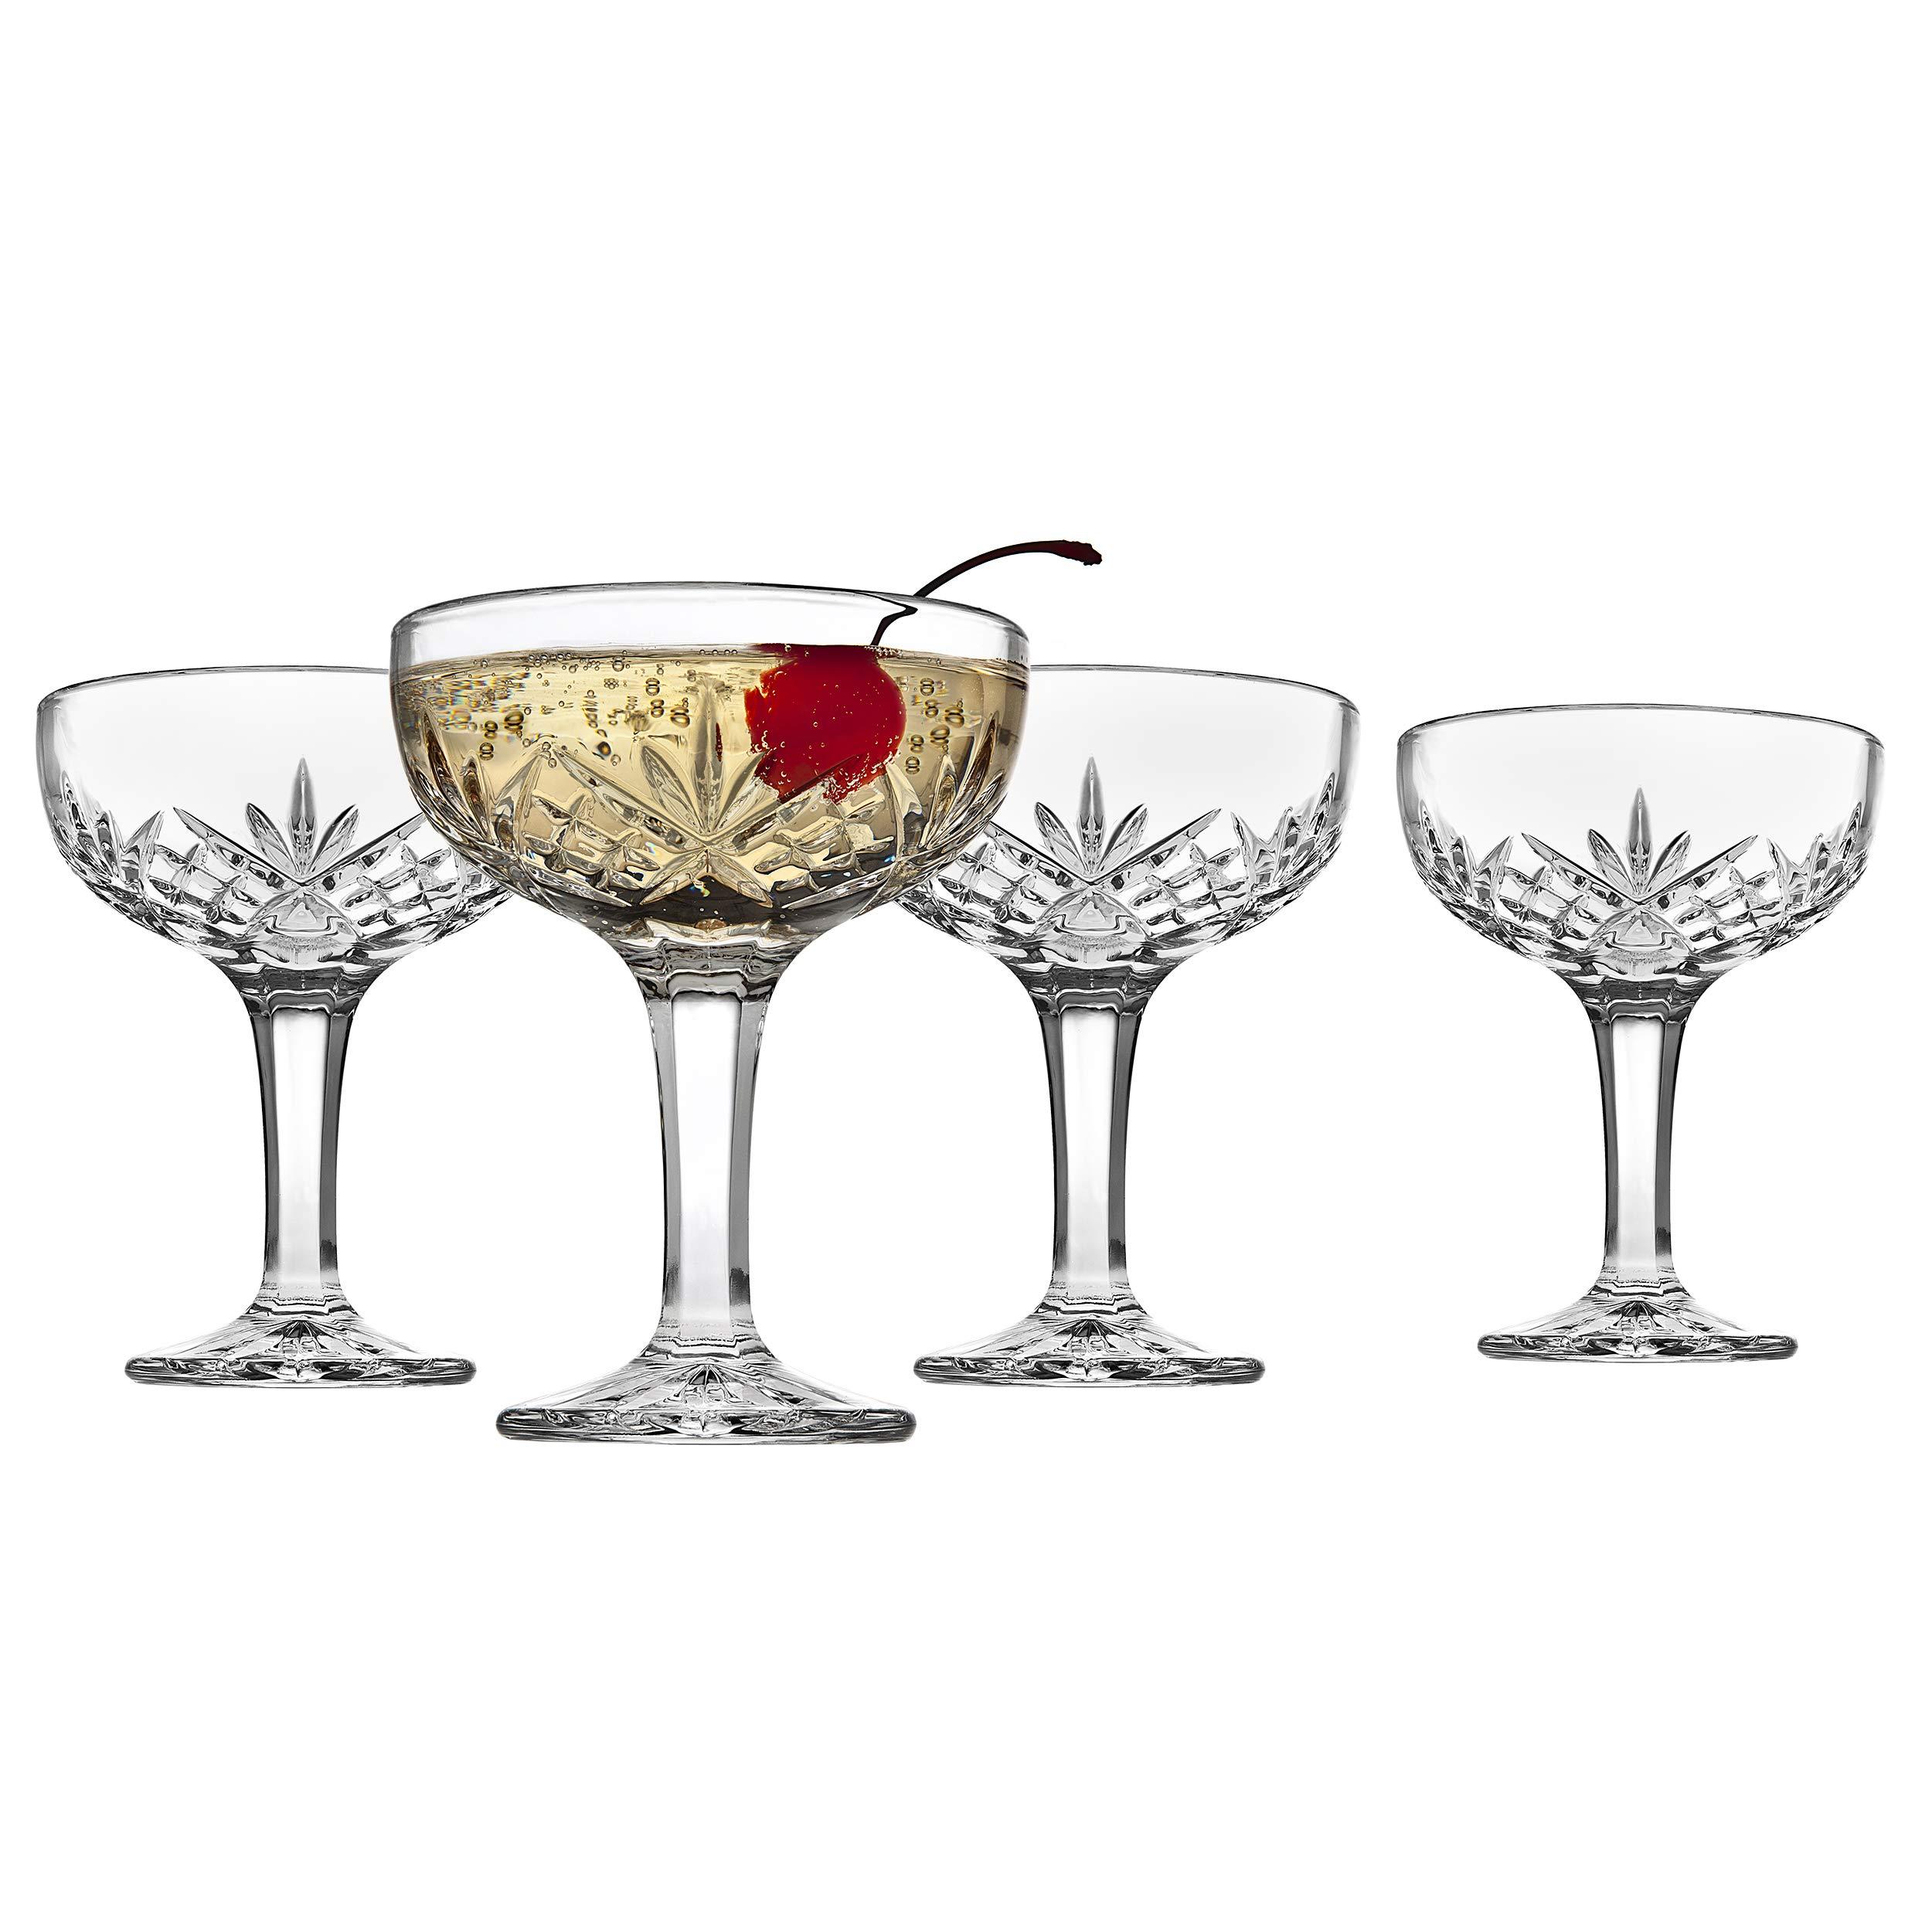 Godinger Champagne Coupe Barware Glasses Set Of 4 Dublin Crystal Collection Buy Online In Bahamas At Bahamas Desertcart Com Productid 88309907